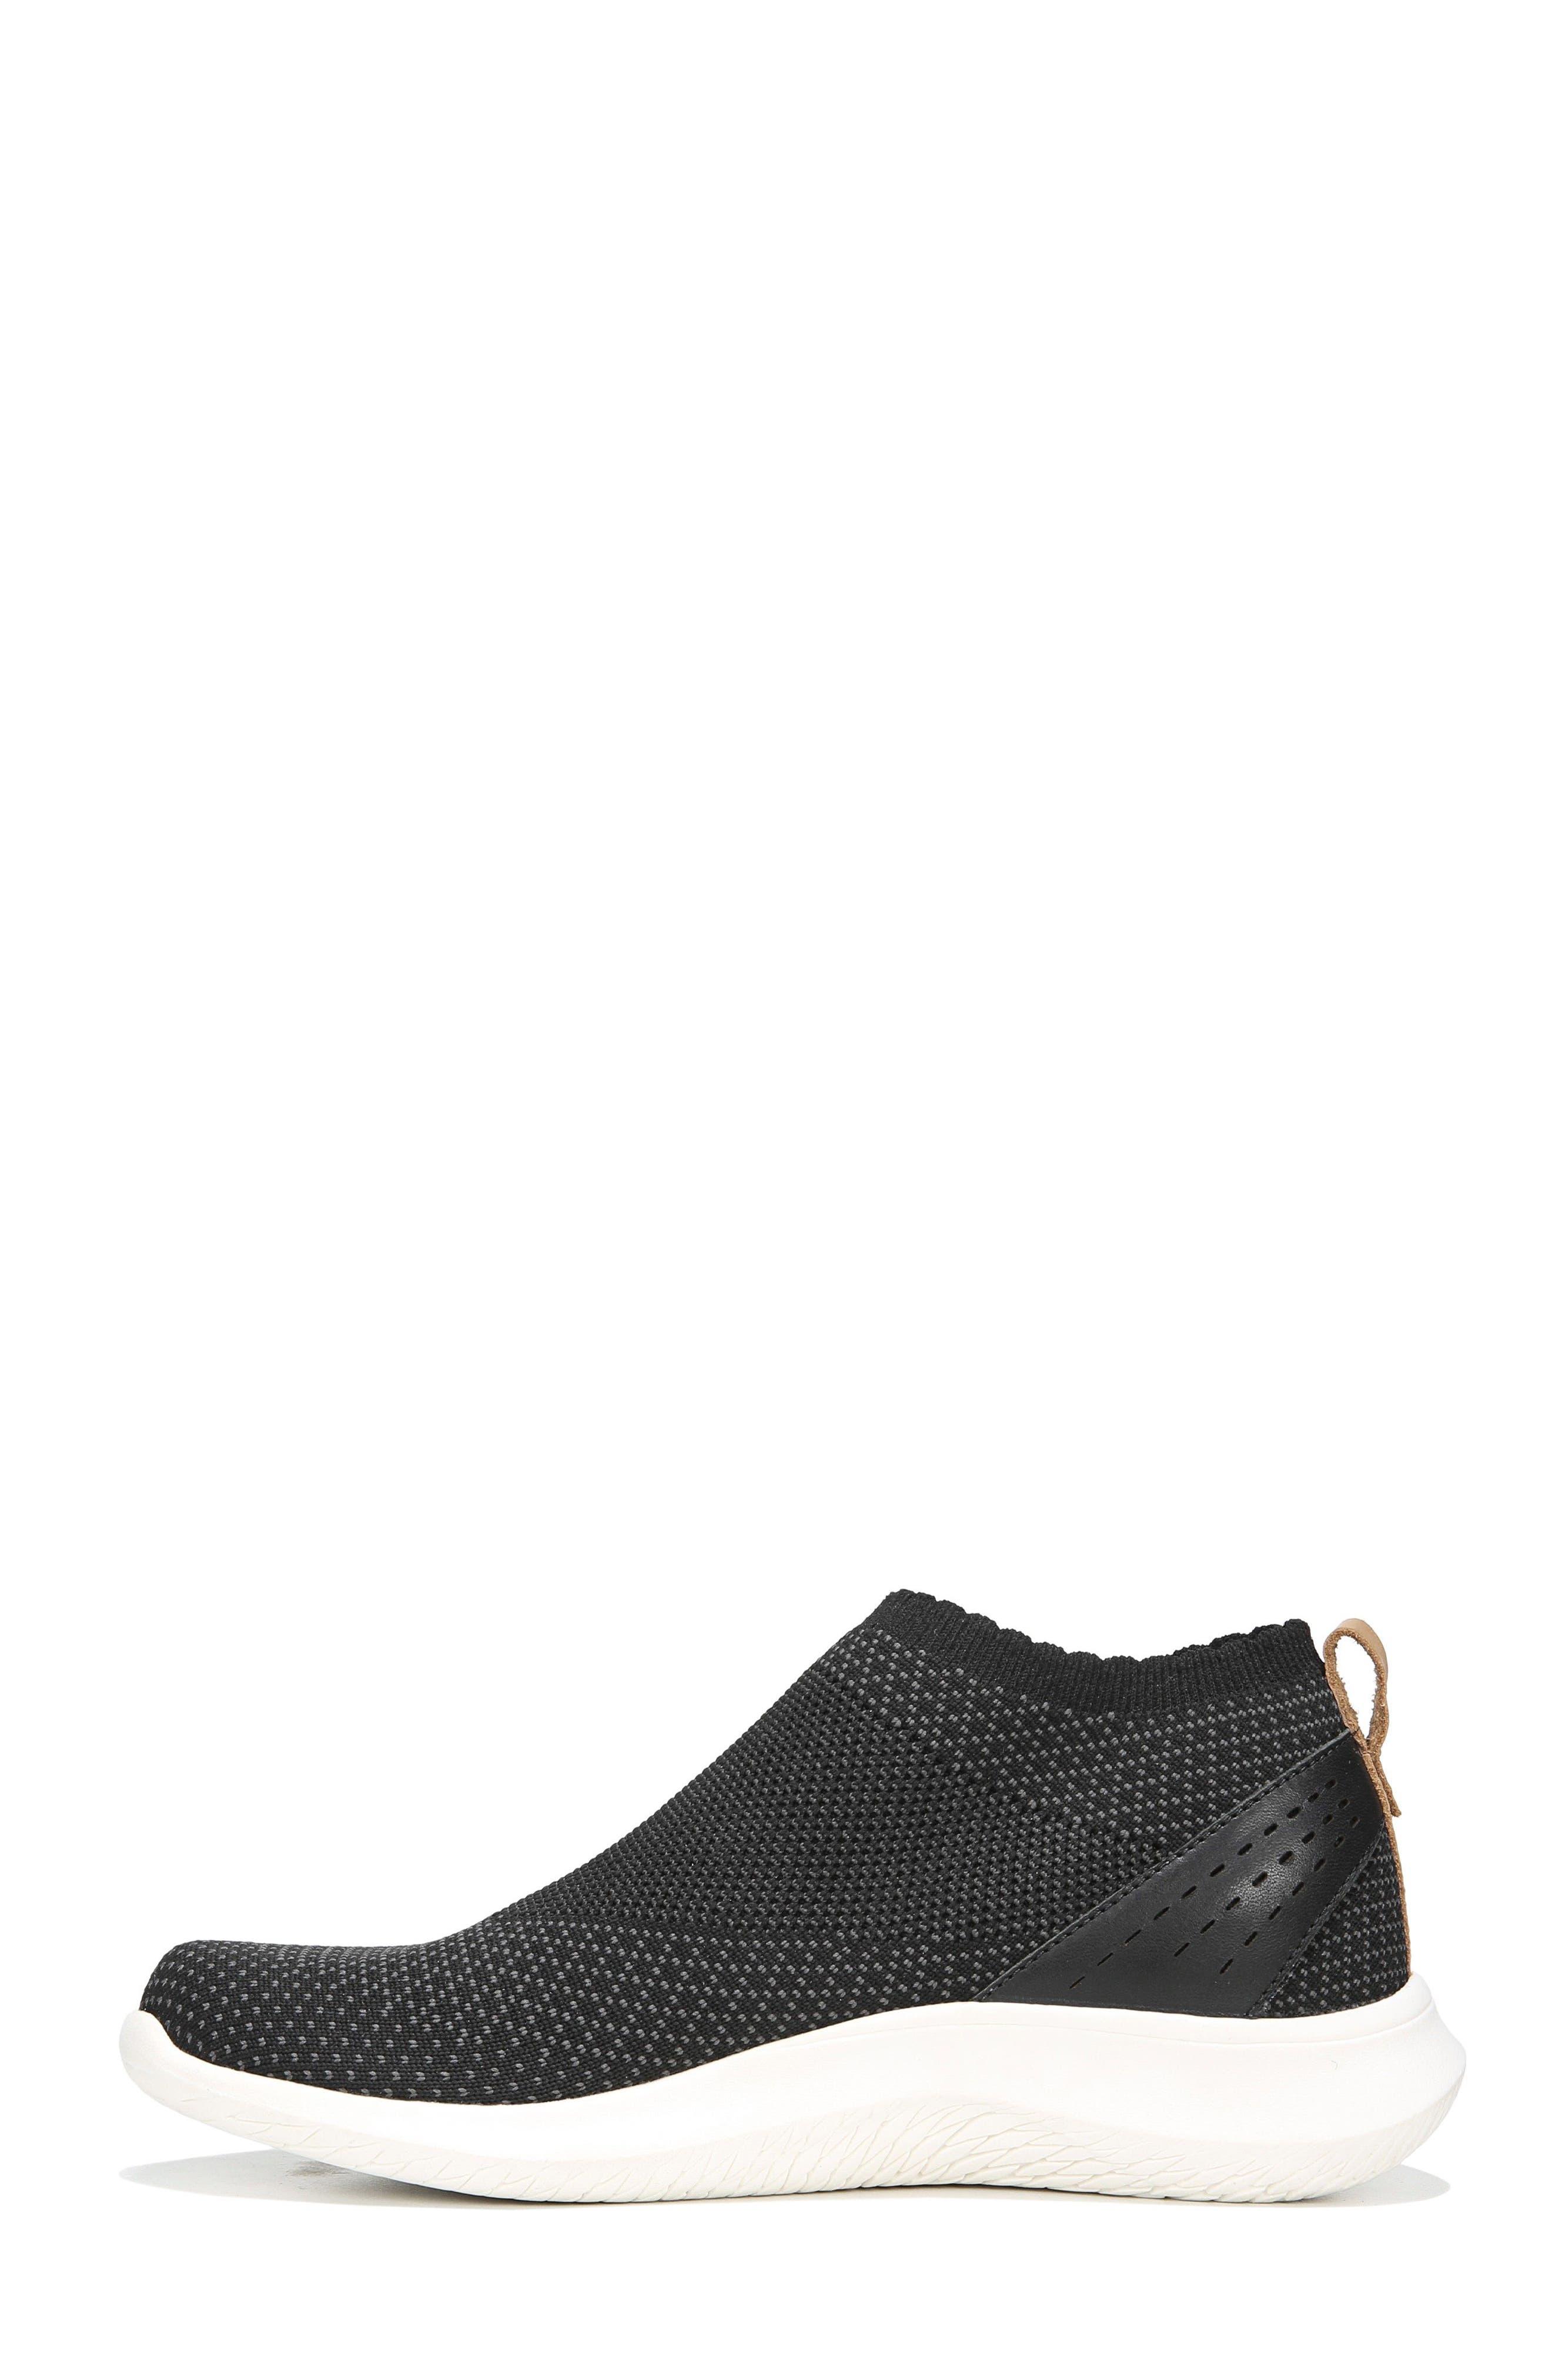 Fierce Knit Slip-On Sneaker,                             Alternate thumbnail 3, color,                             BLACK KNIT FABRIC